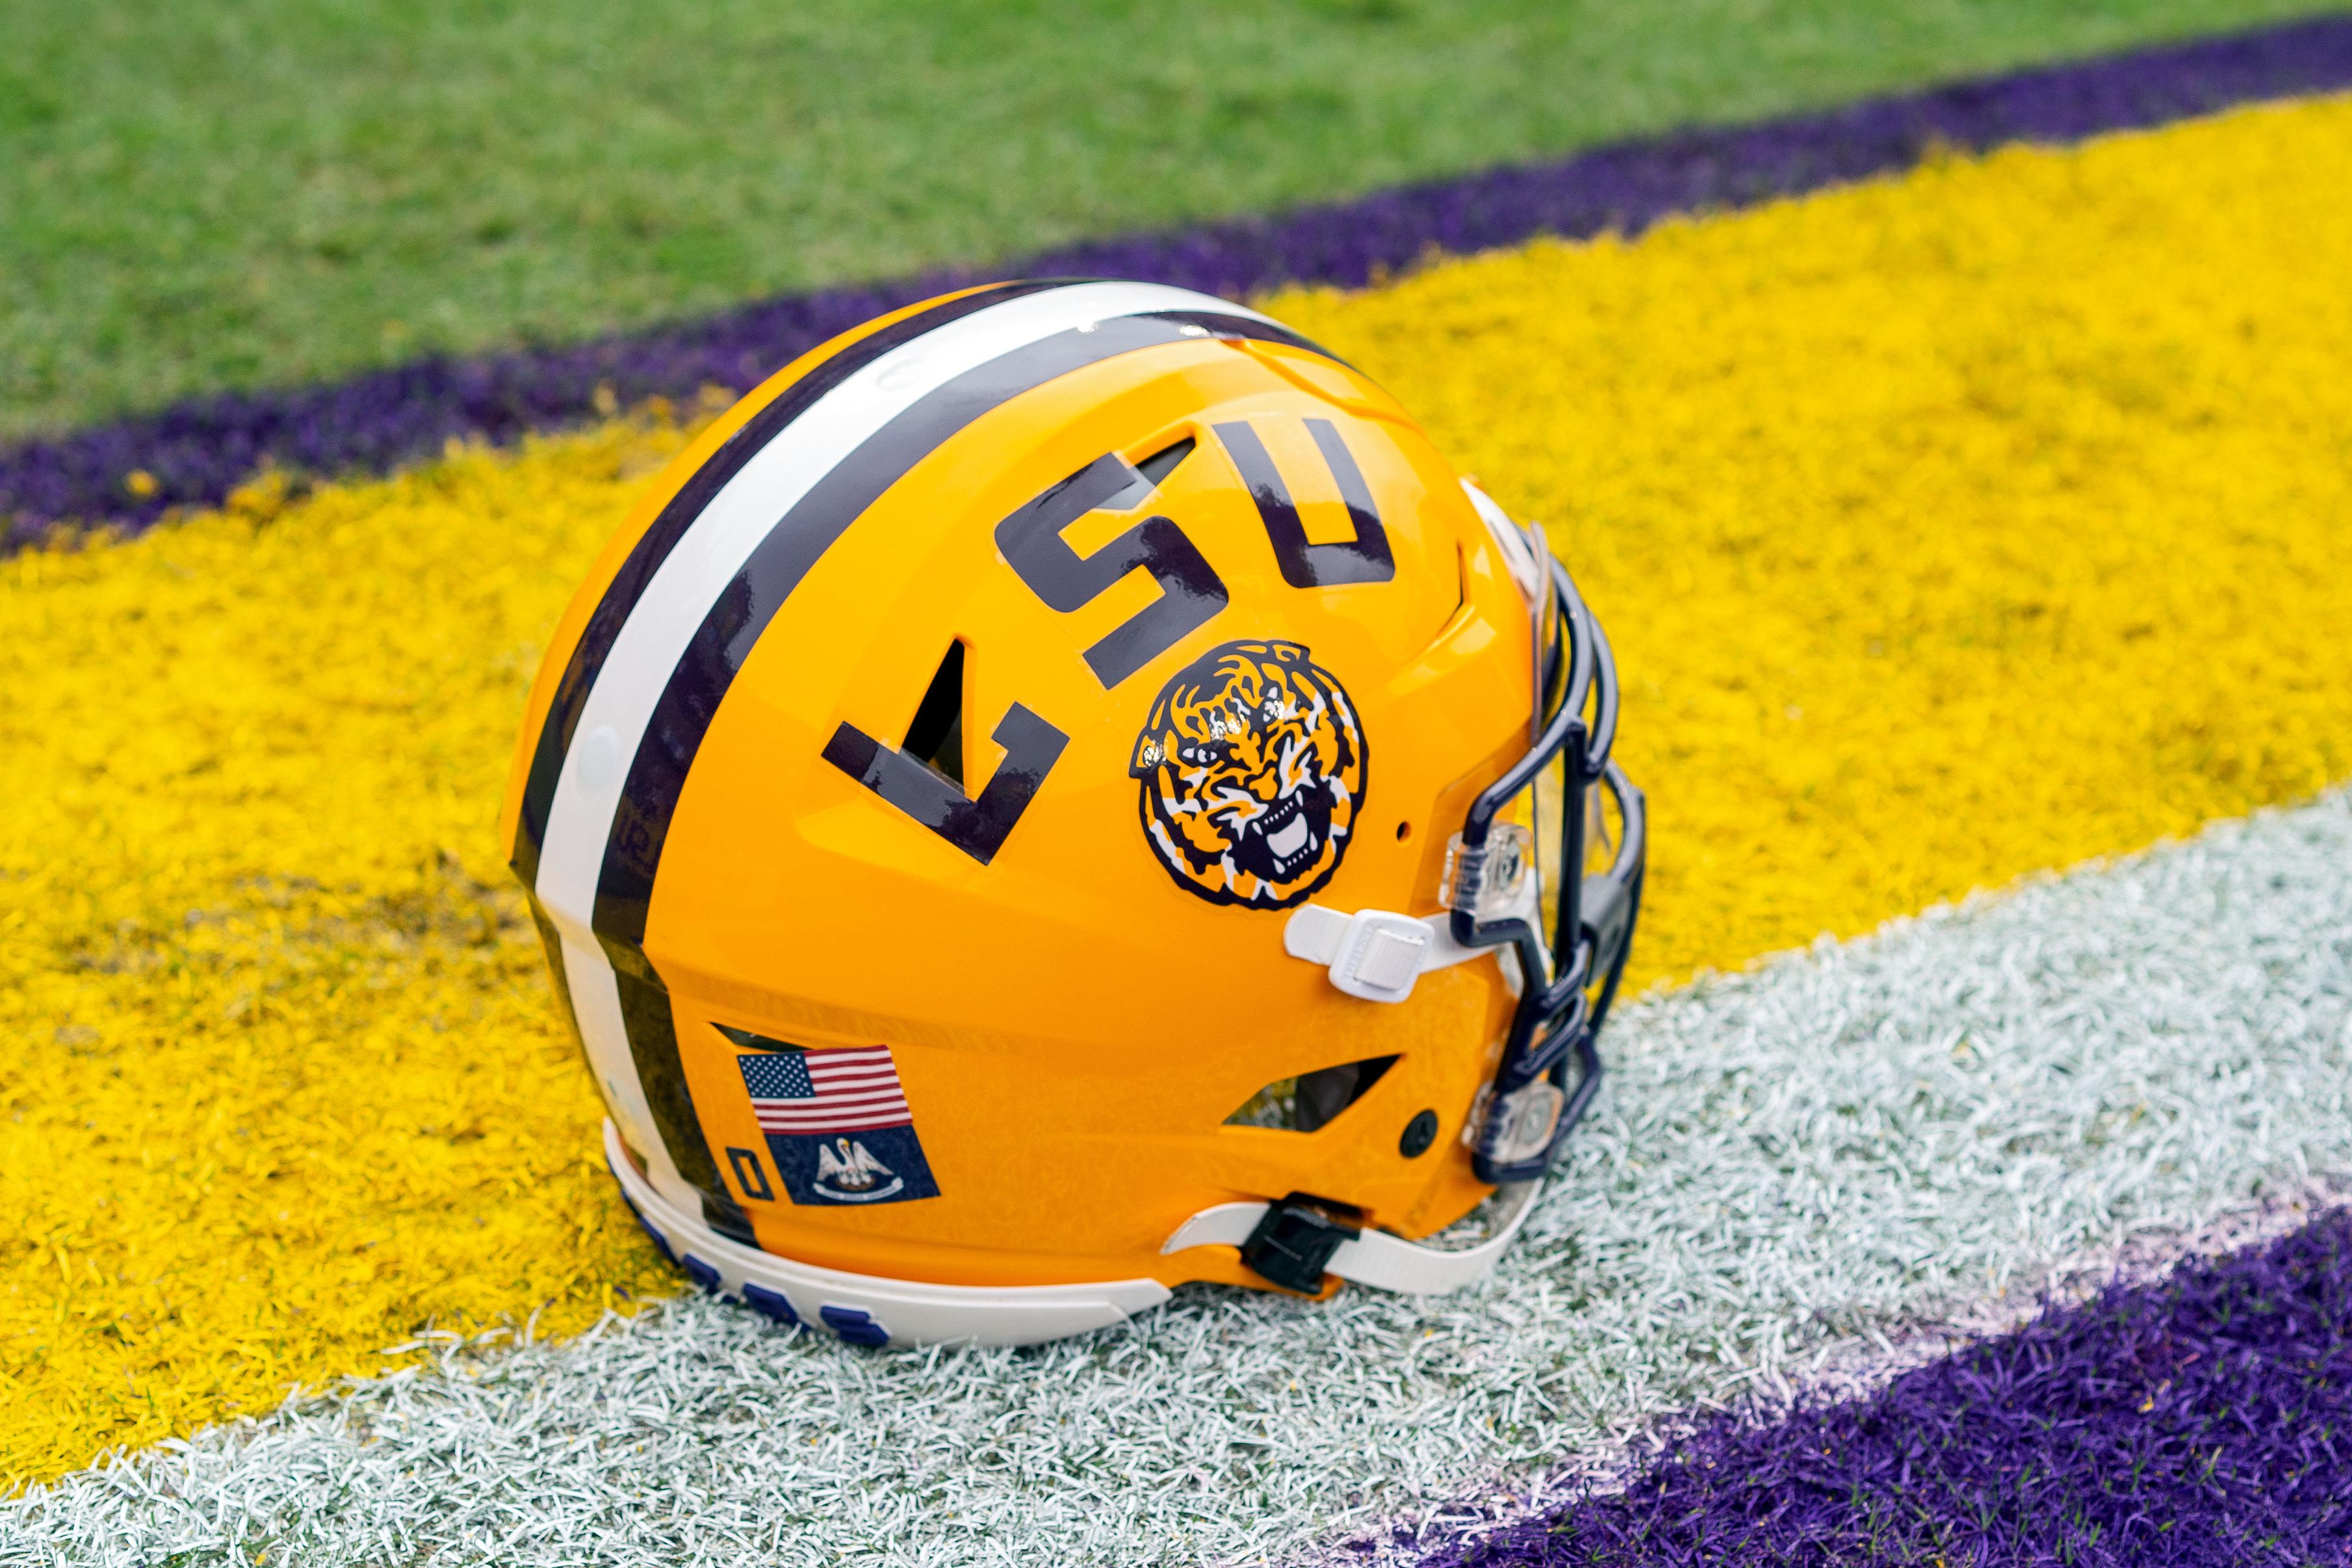 COLLEGE FOOTBALL: OCT 26 Auburn at LSU